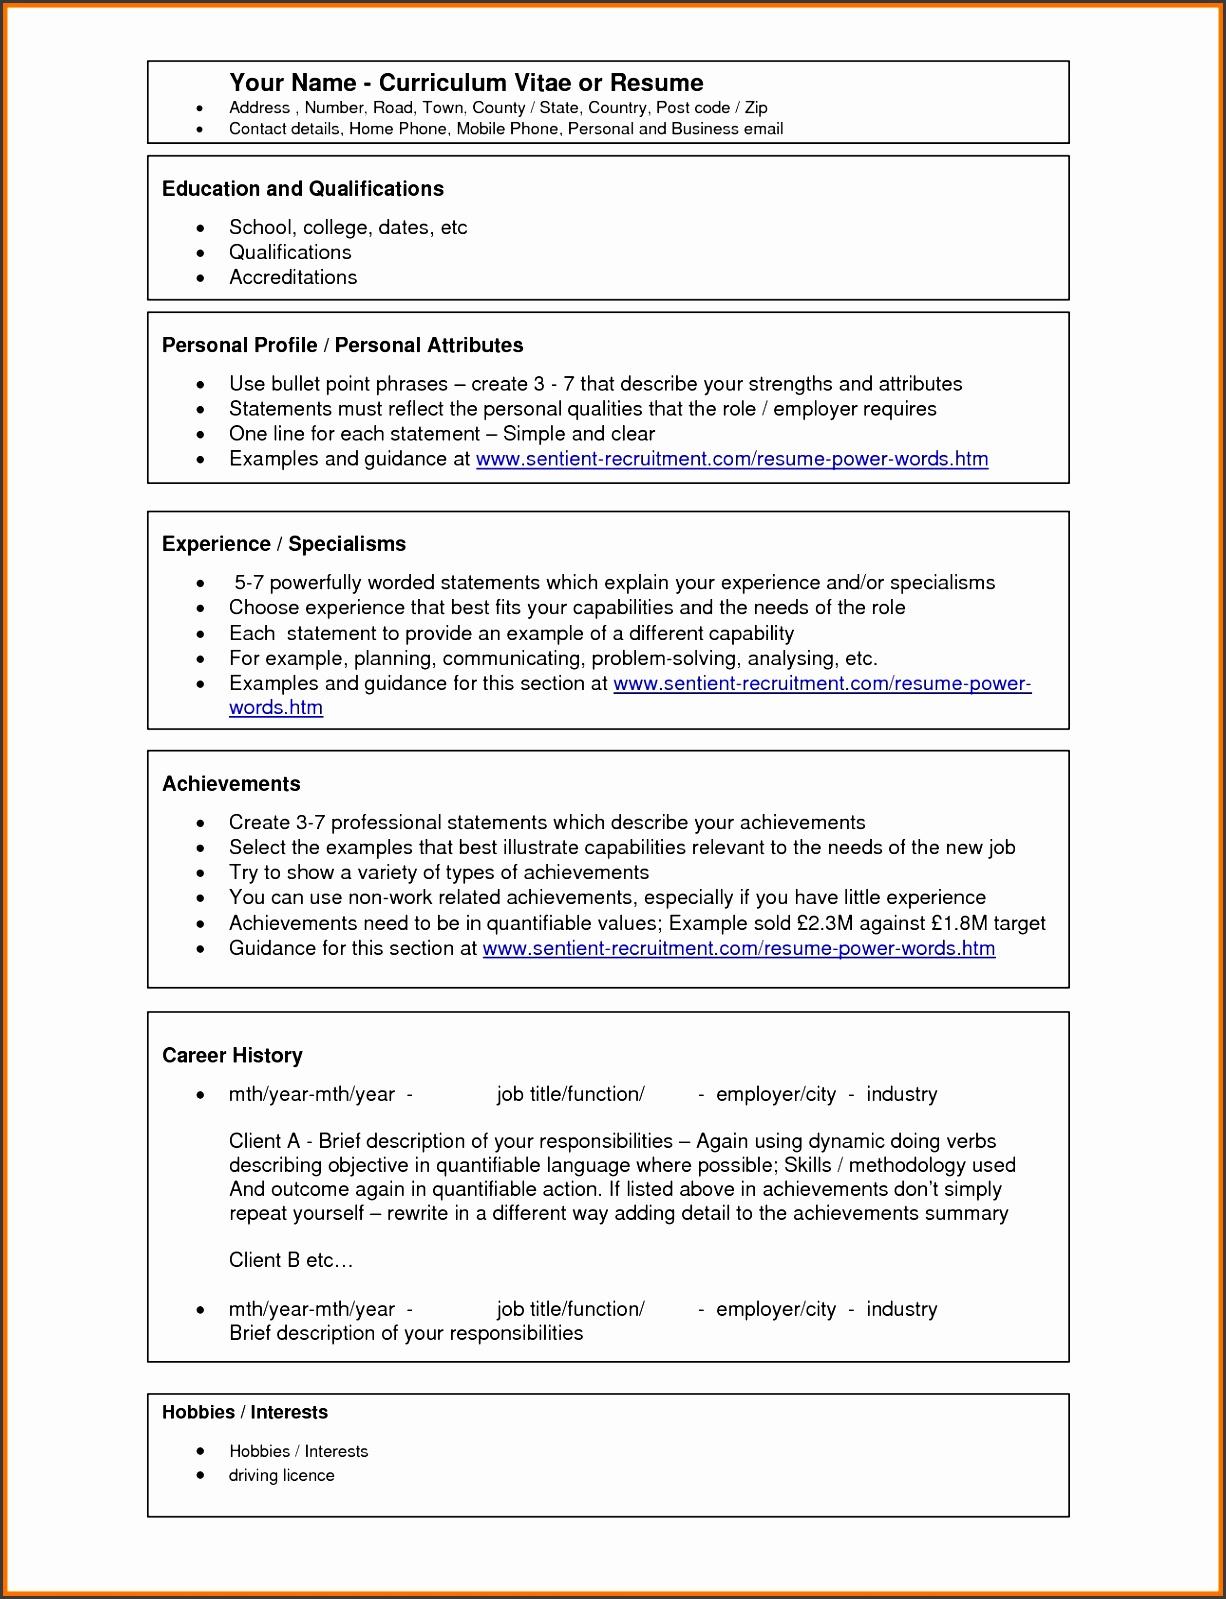 my blueprint resume builder business agreements sample